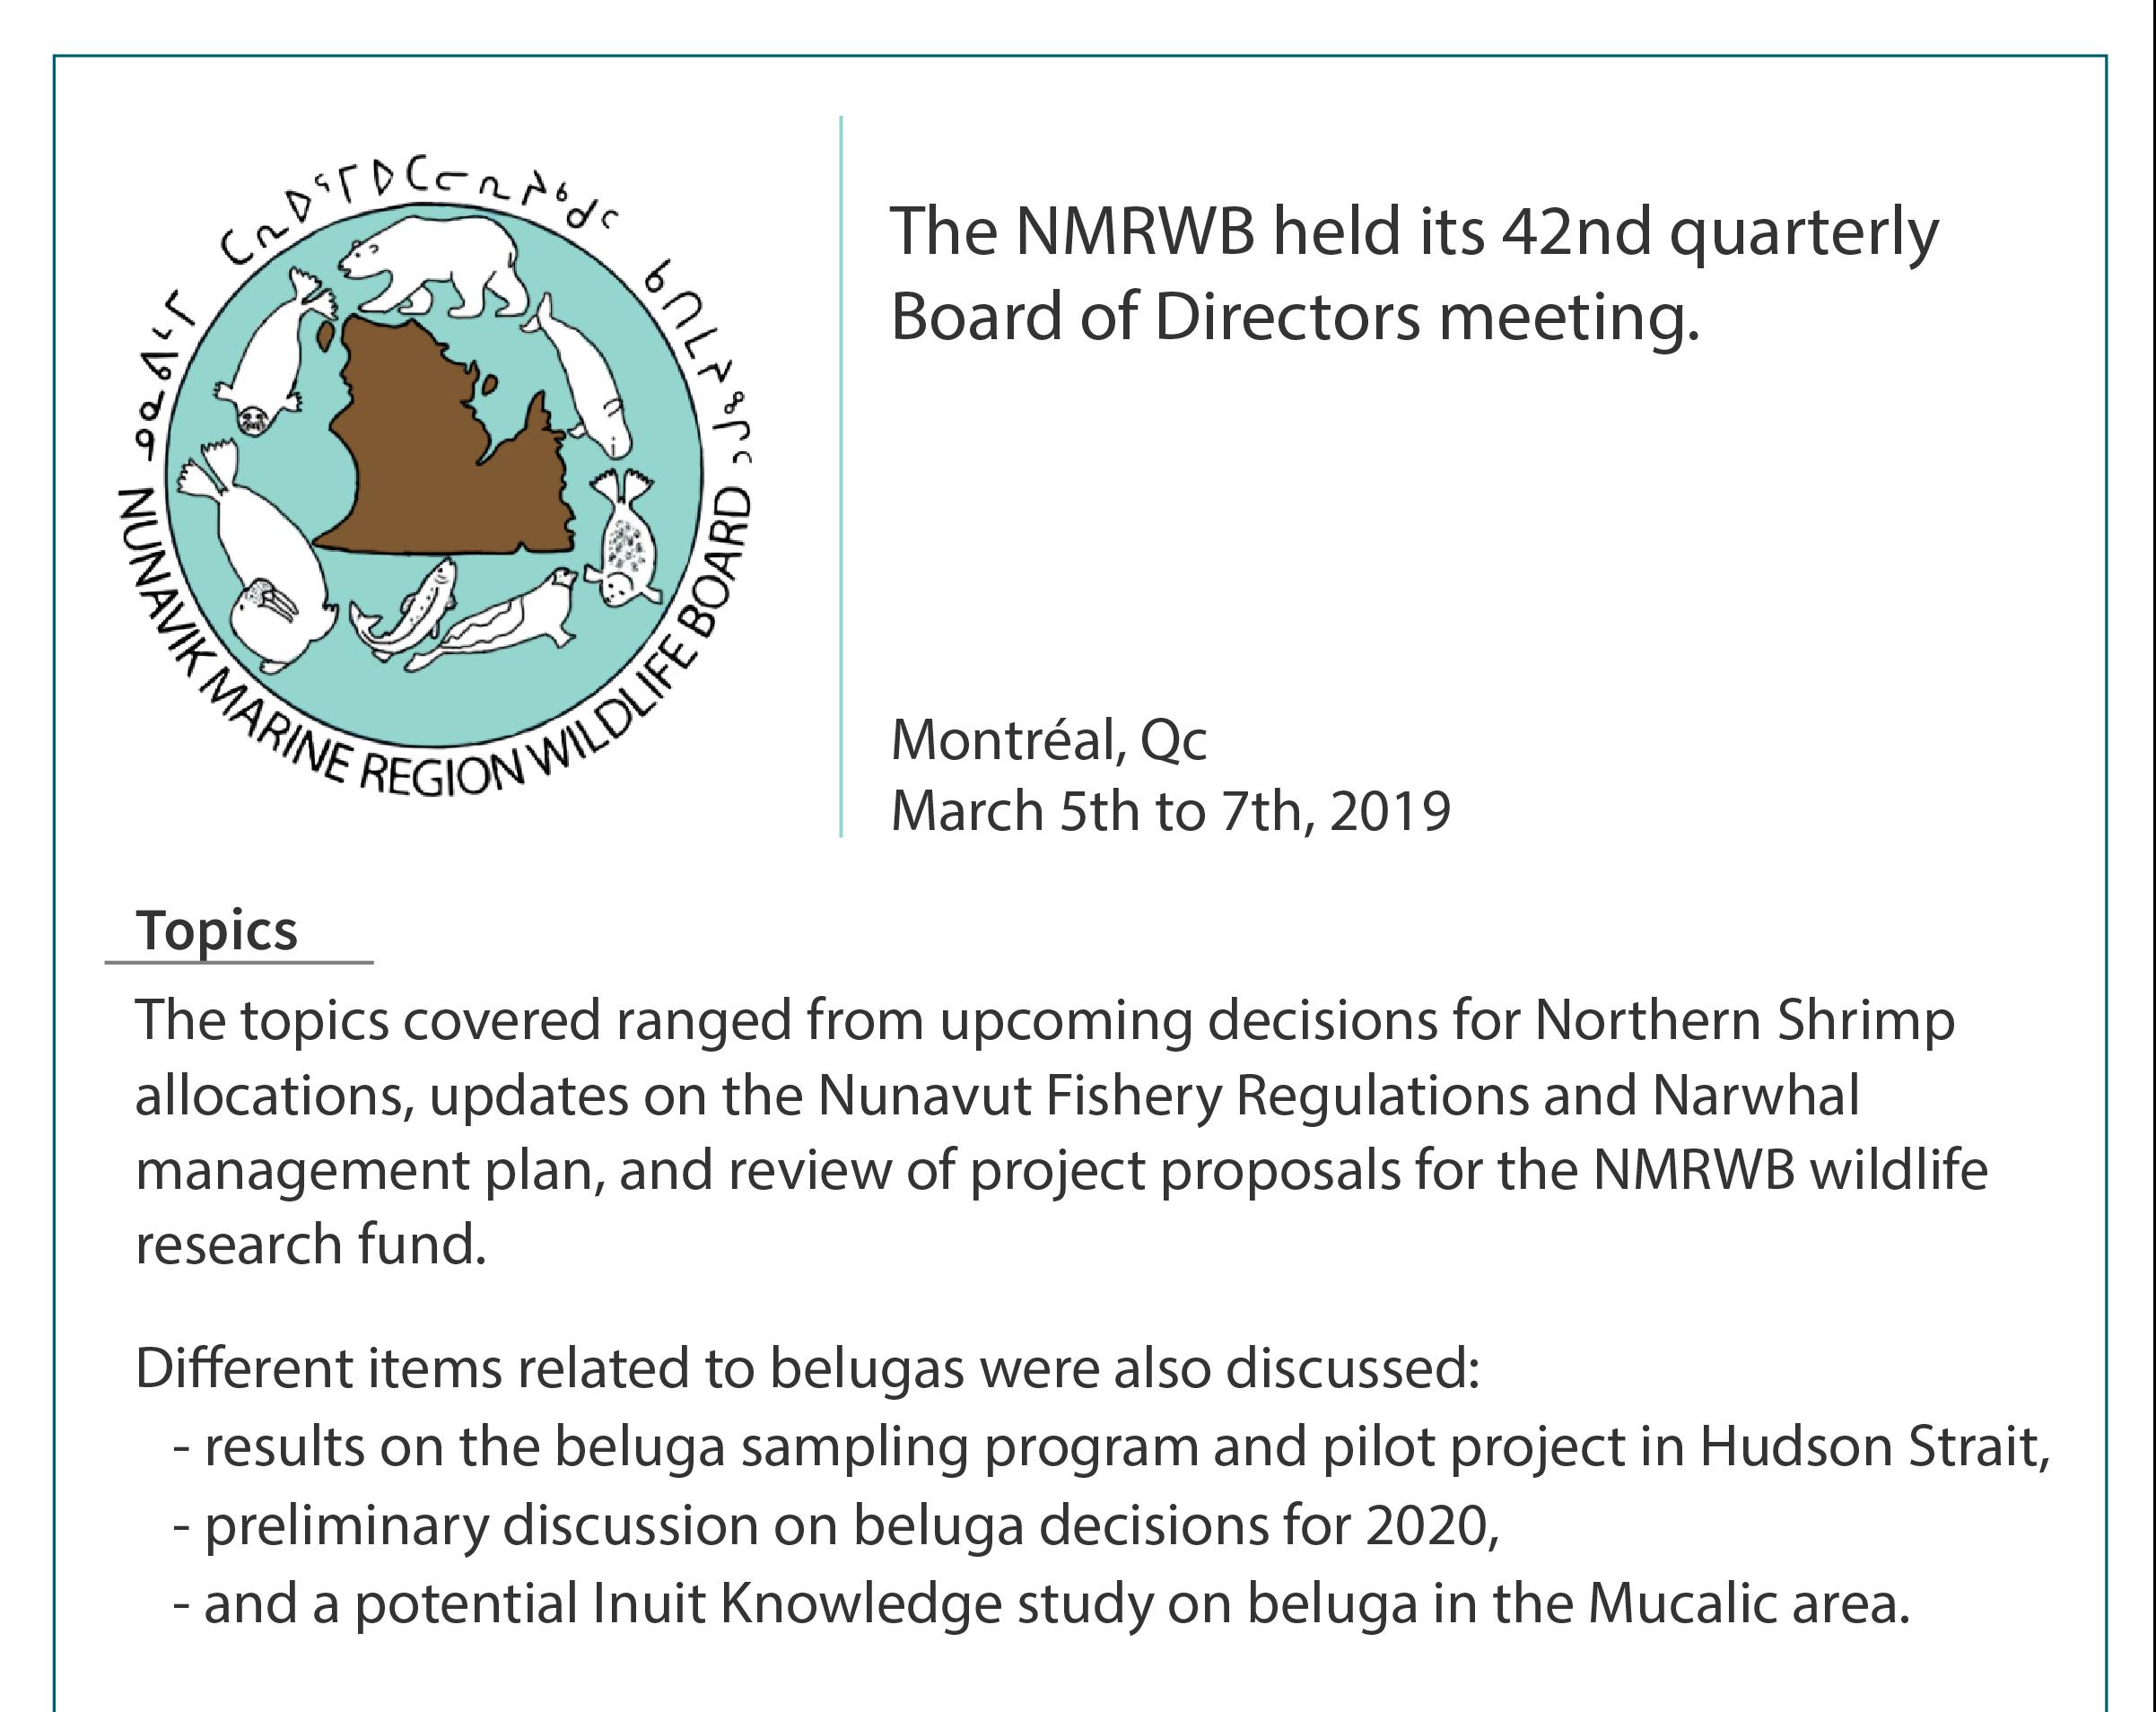 NMRWB – The Nunavik Marine Region Wildlife Board